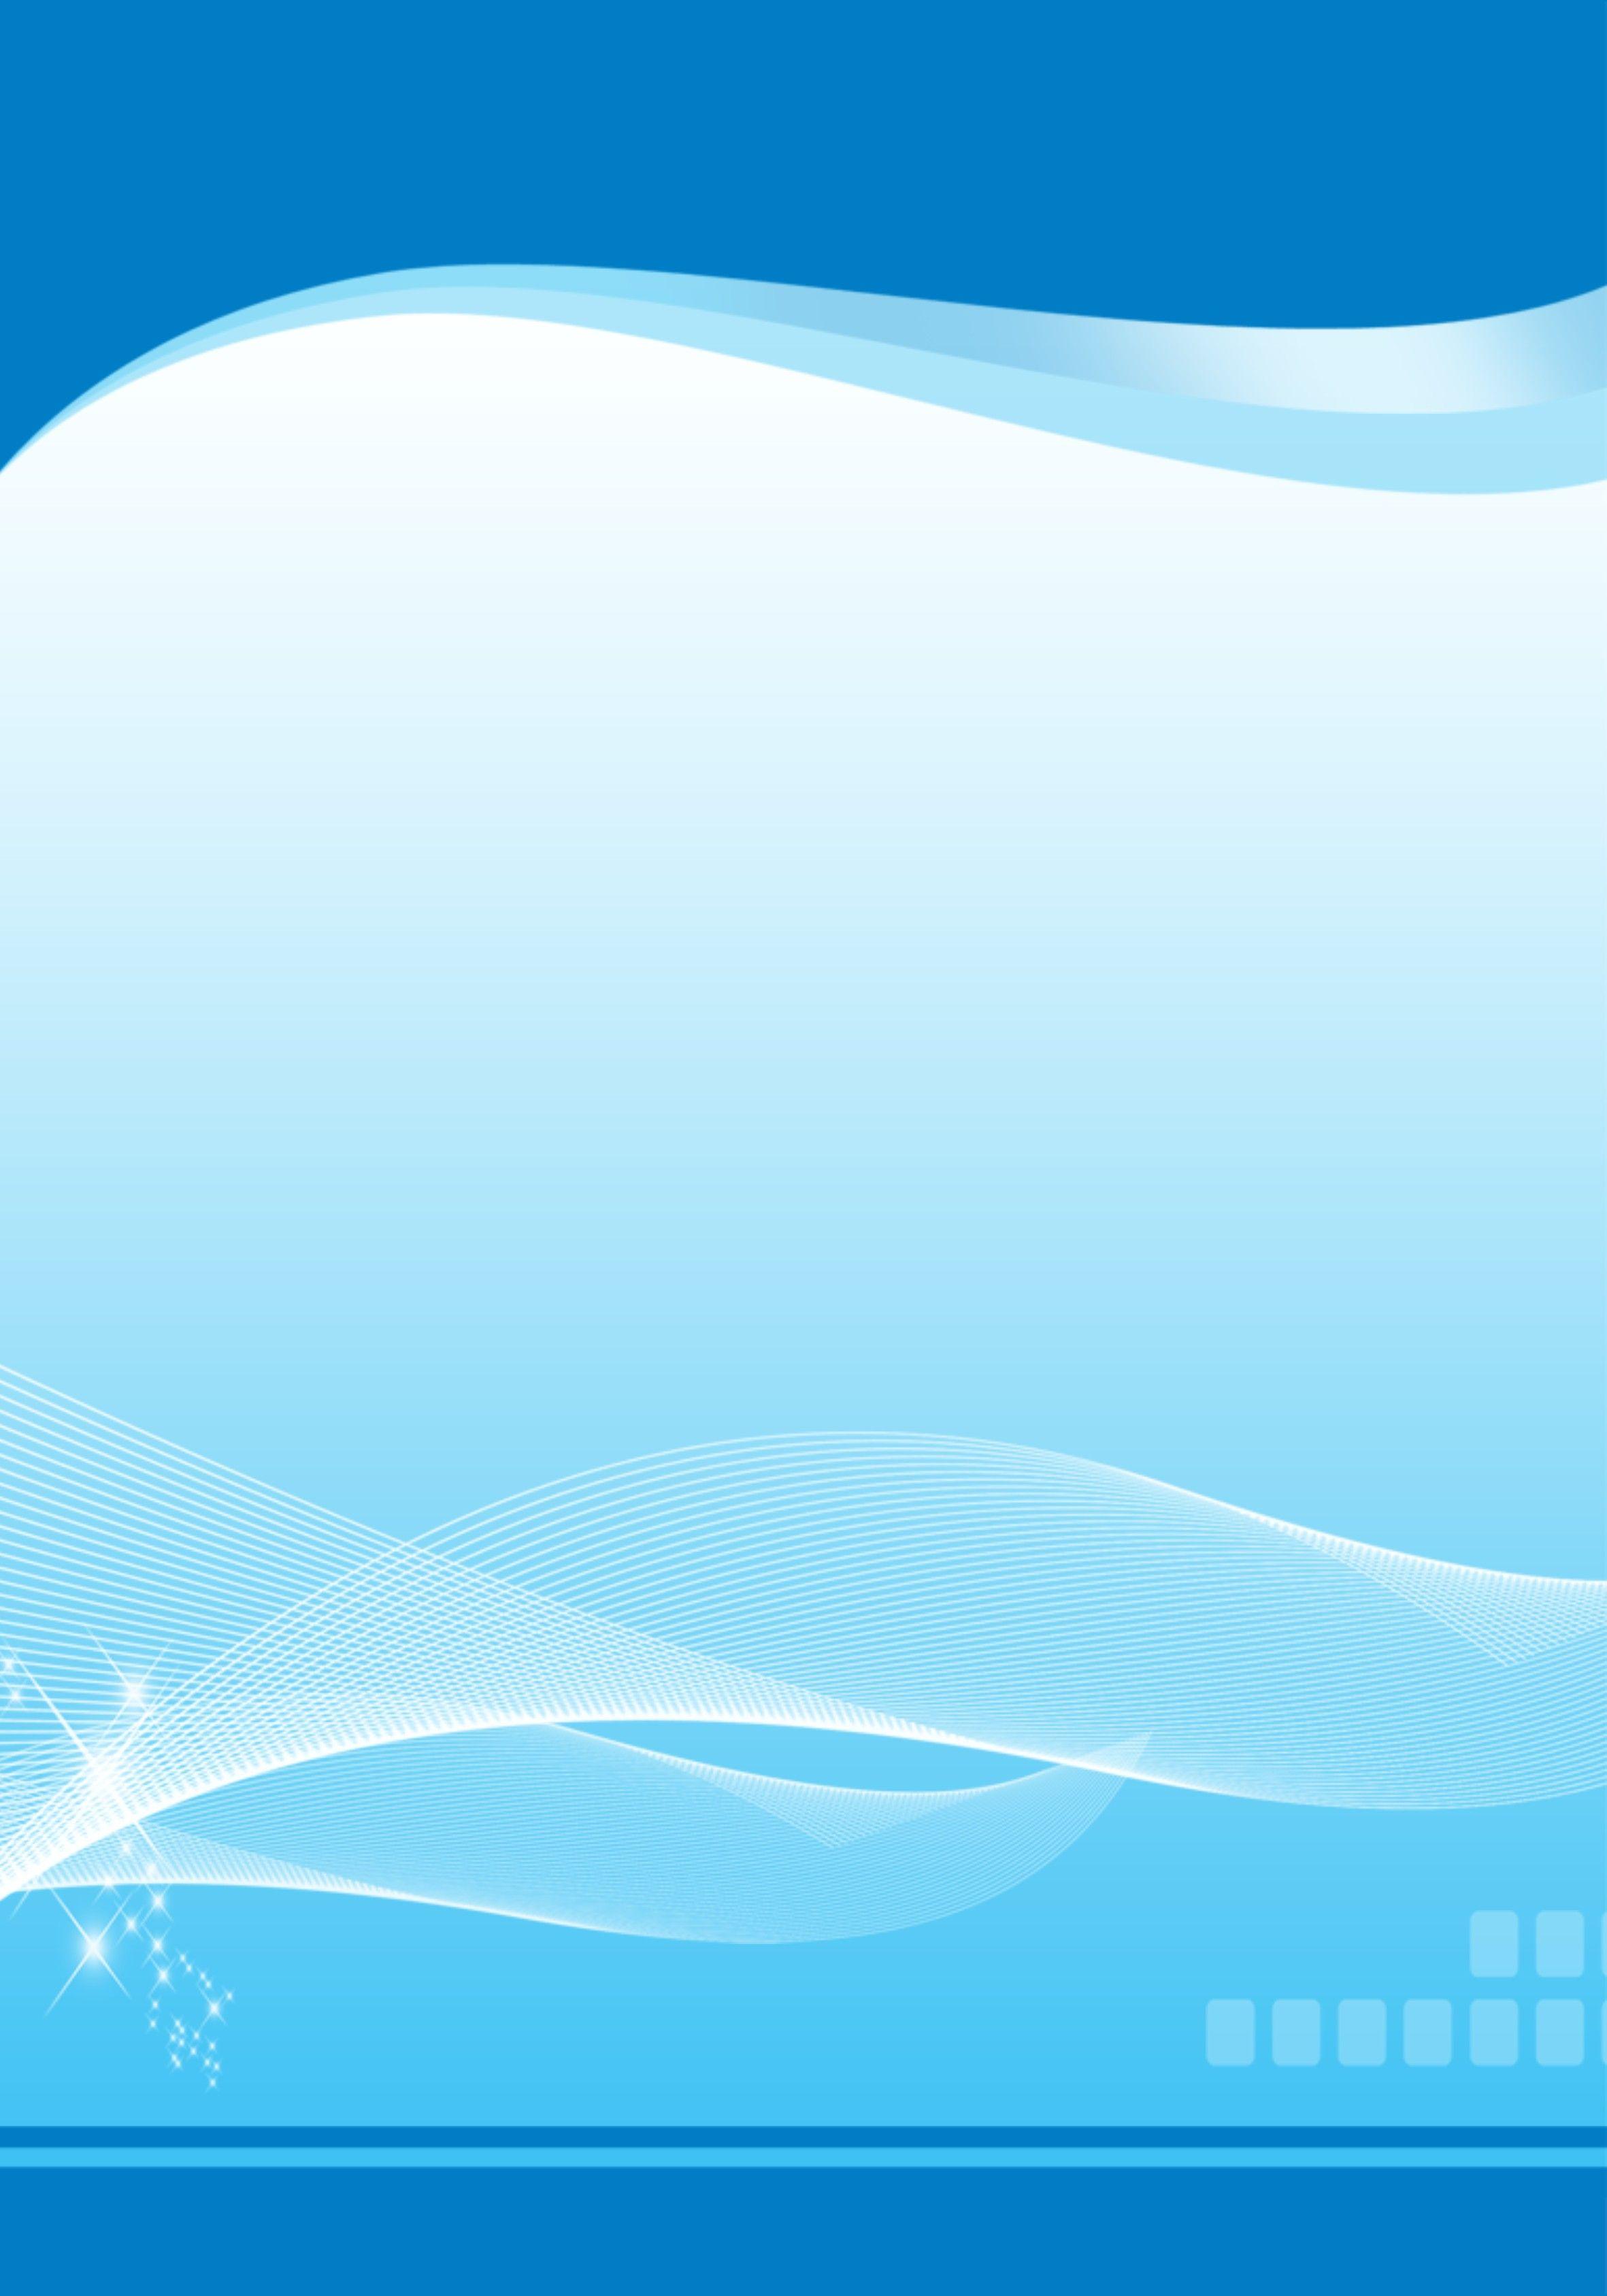 enterprise poster background template